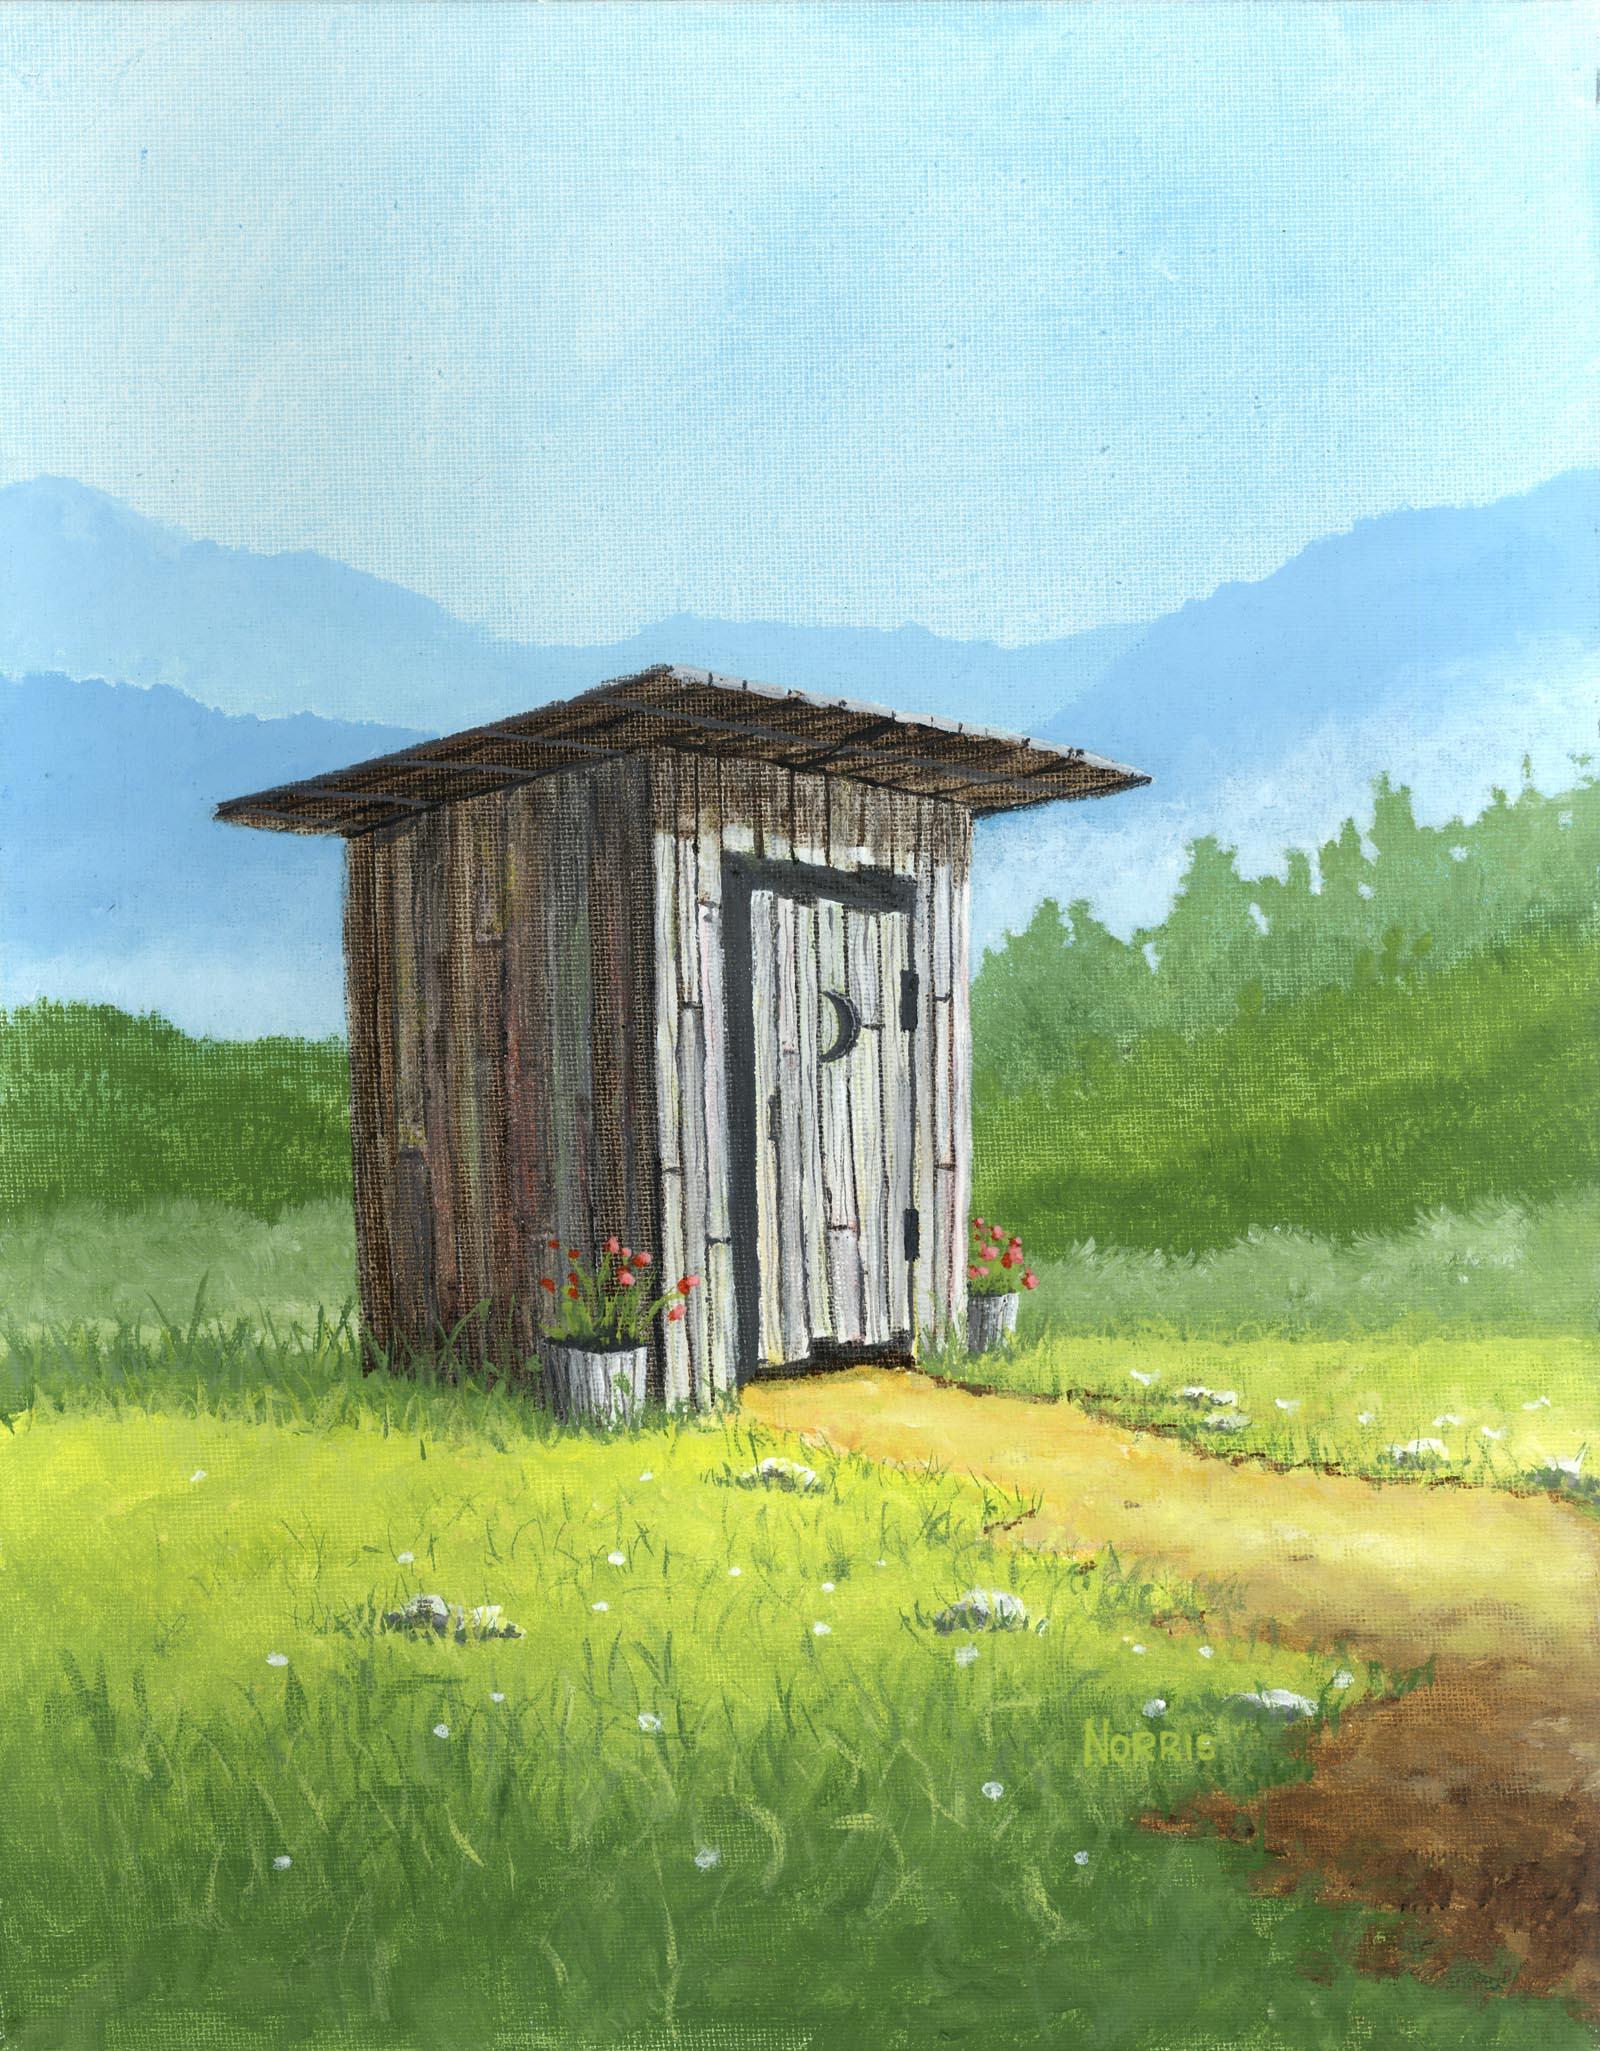 Outhouse #3